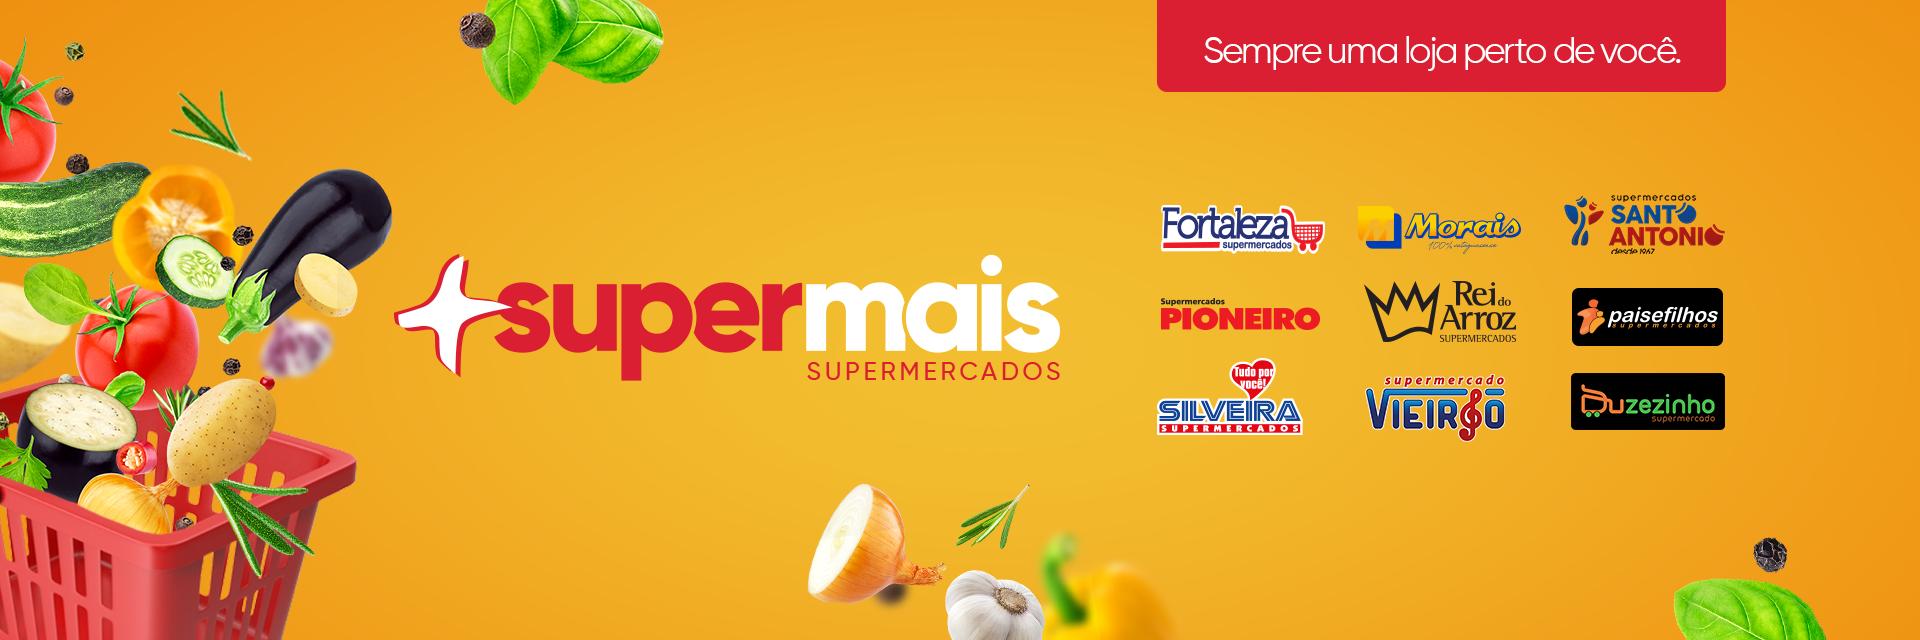 Banner Lojas nova logo